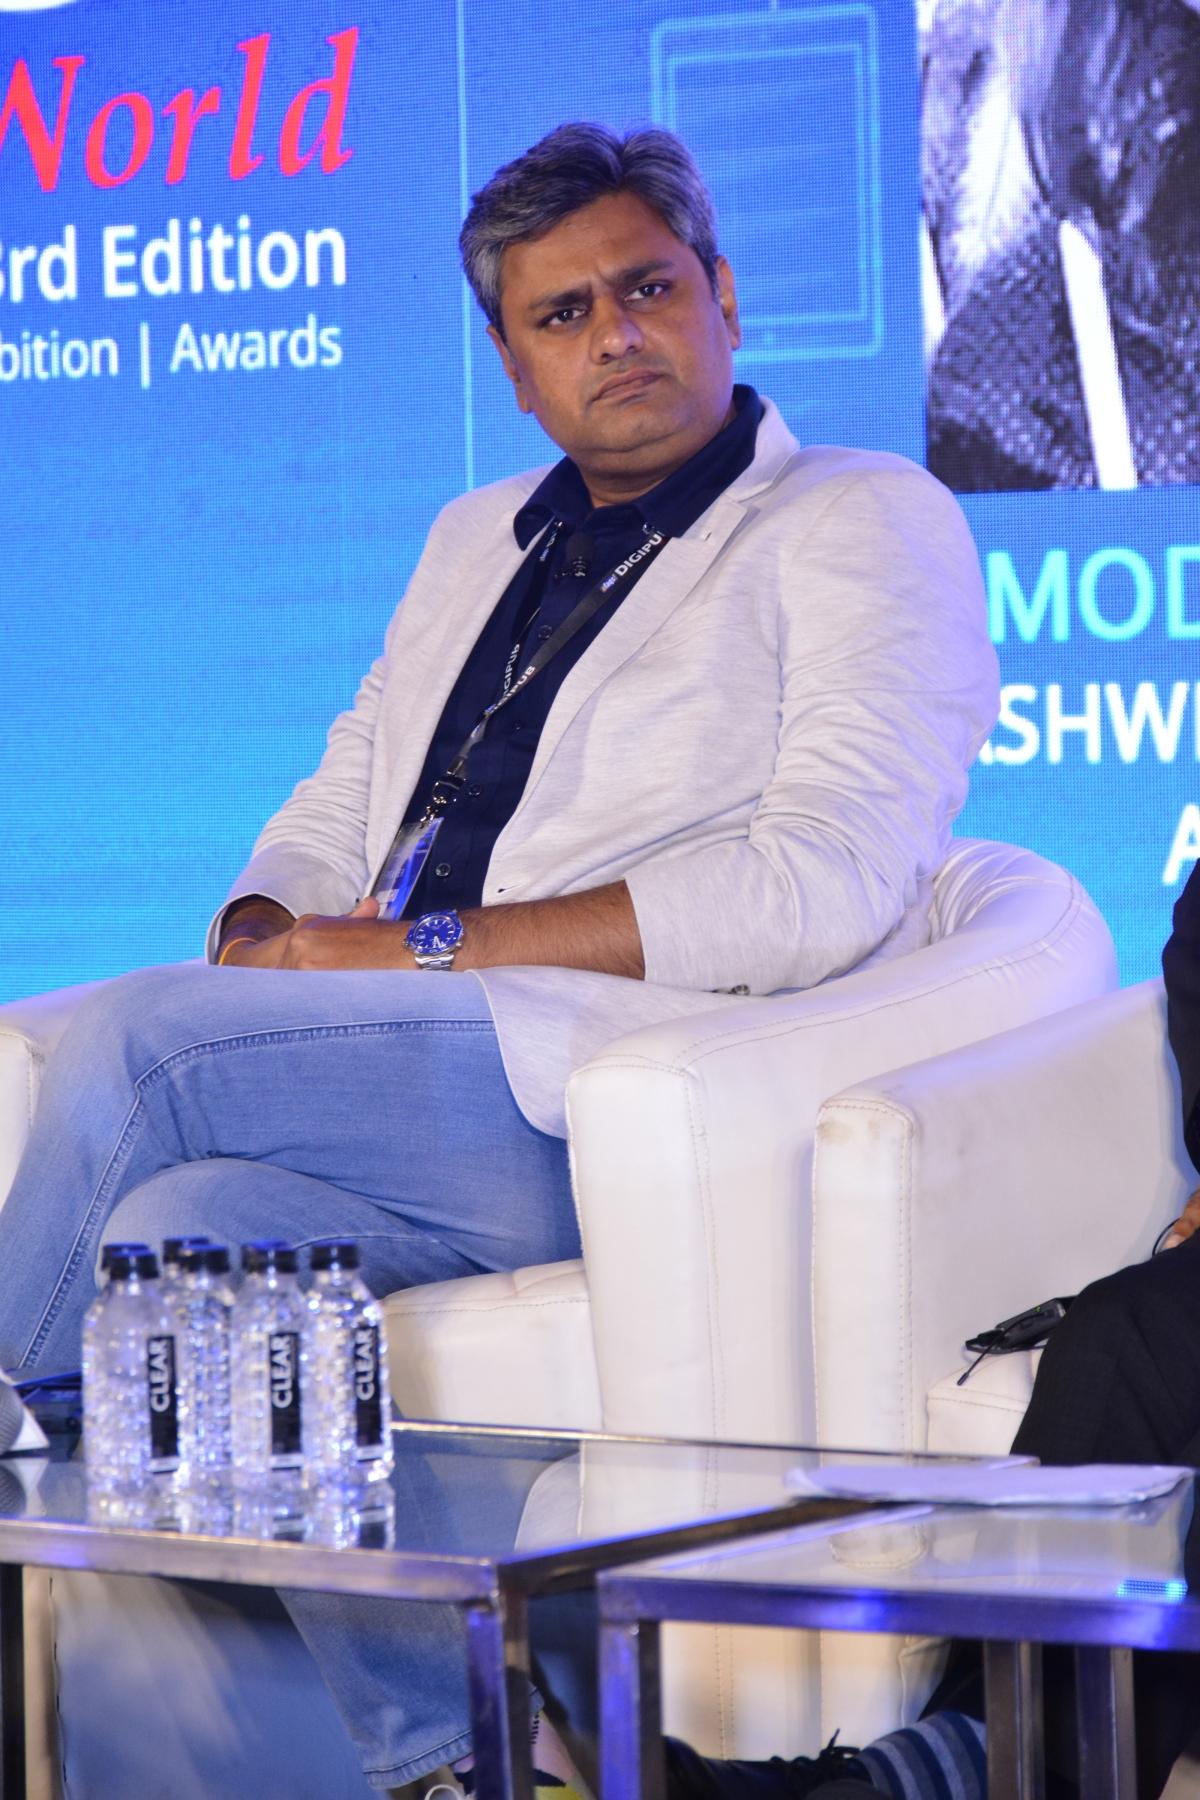 Himanshu Gautam, Business Head - Digital, Amar Ujala Group